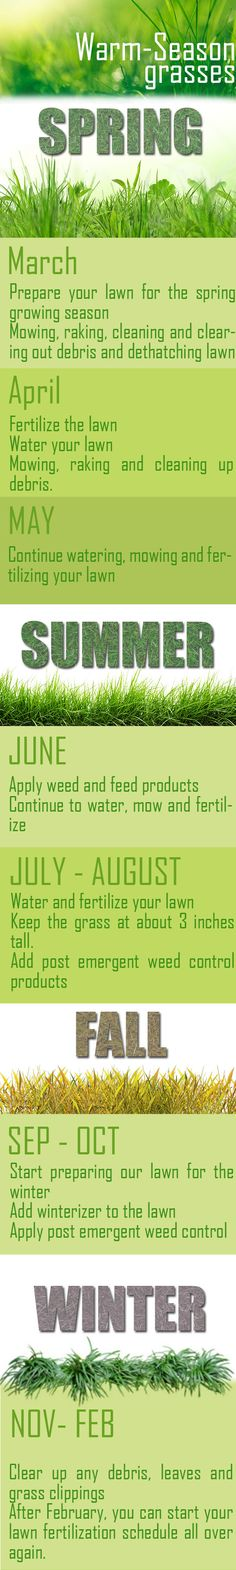 Lawn fertilizing tips for warm season grasses | http://www.goldensunlandscapingsvc.com/blog/lawn-fertilizing-schedule/